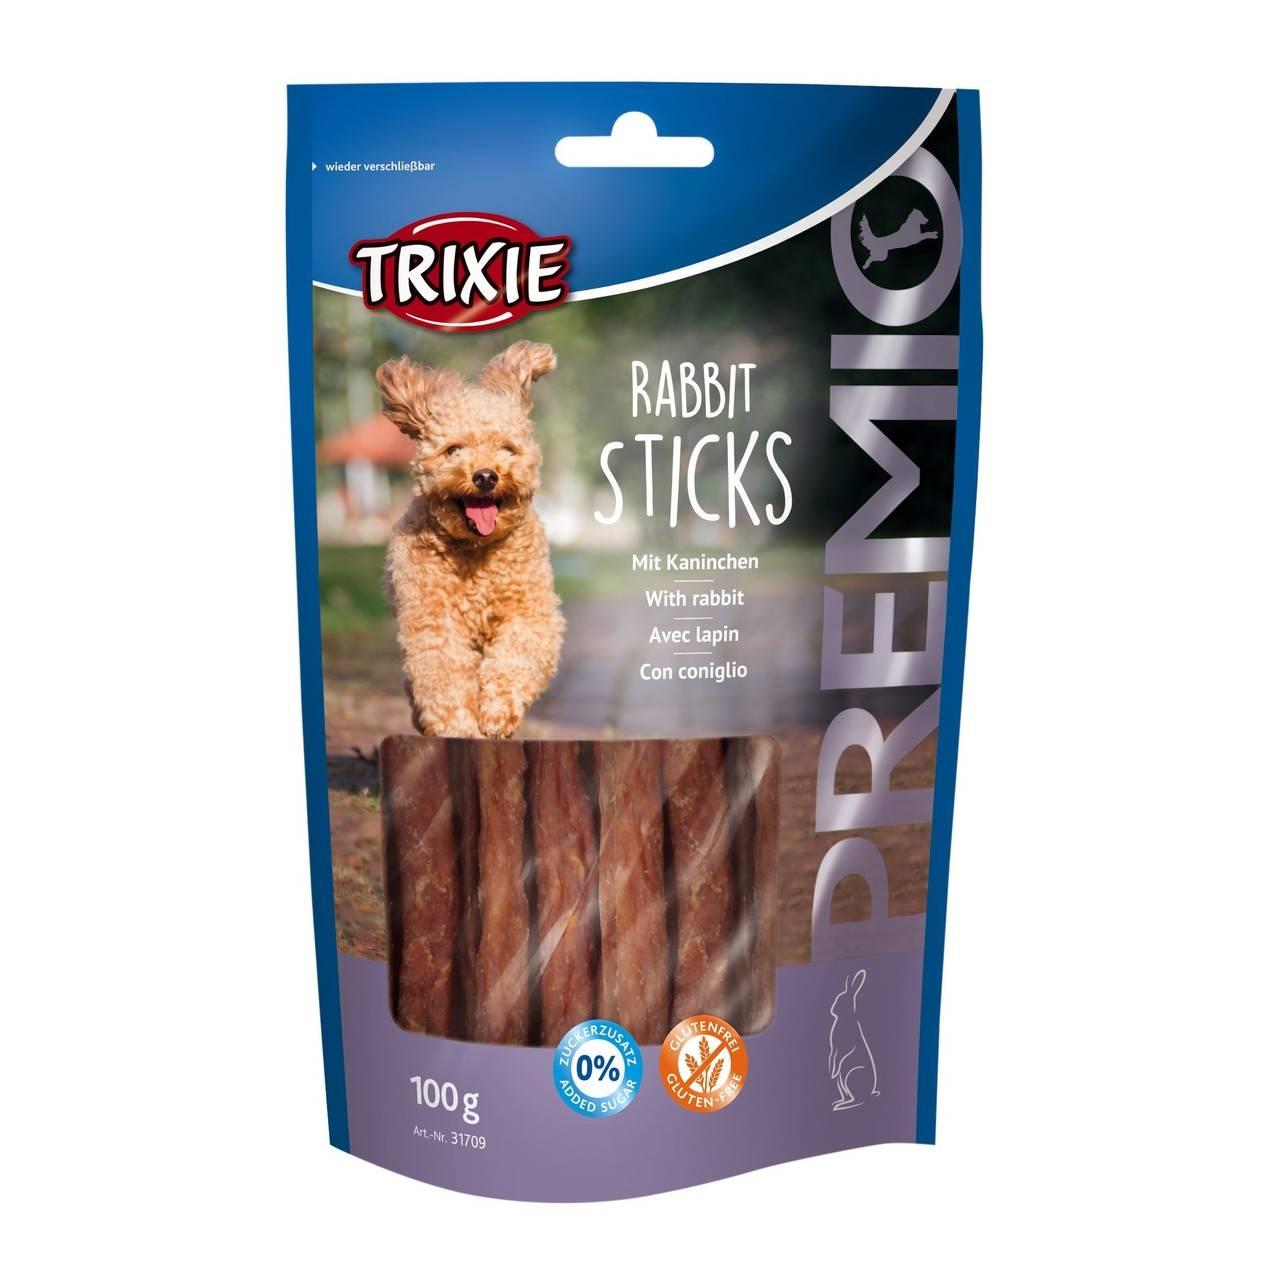 Trixie Premio Rabbit Sticks – лакомство с кроликом для собак